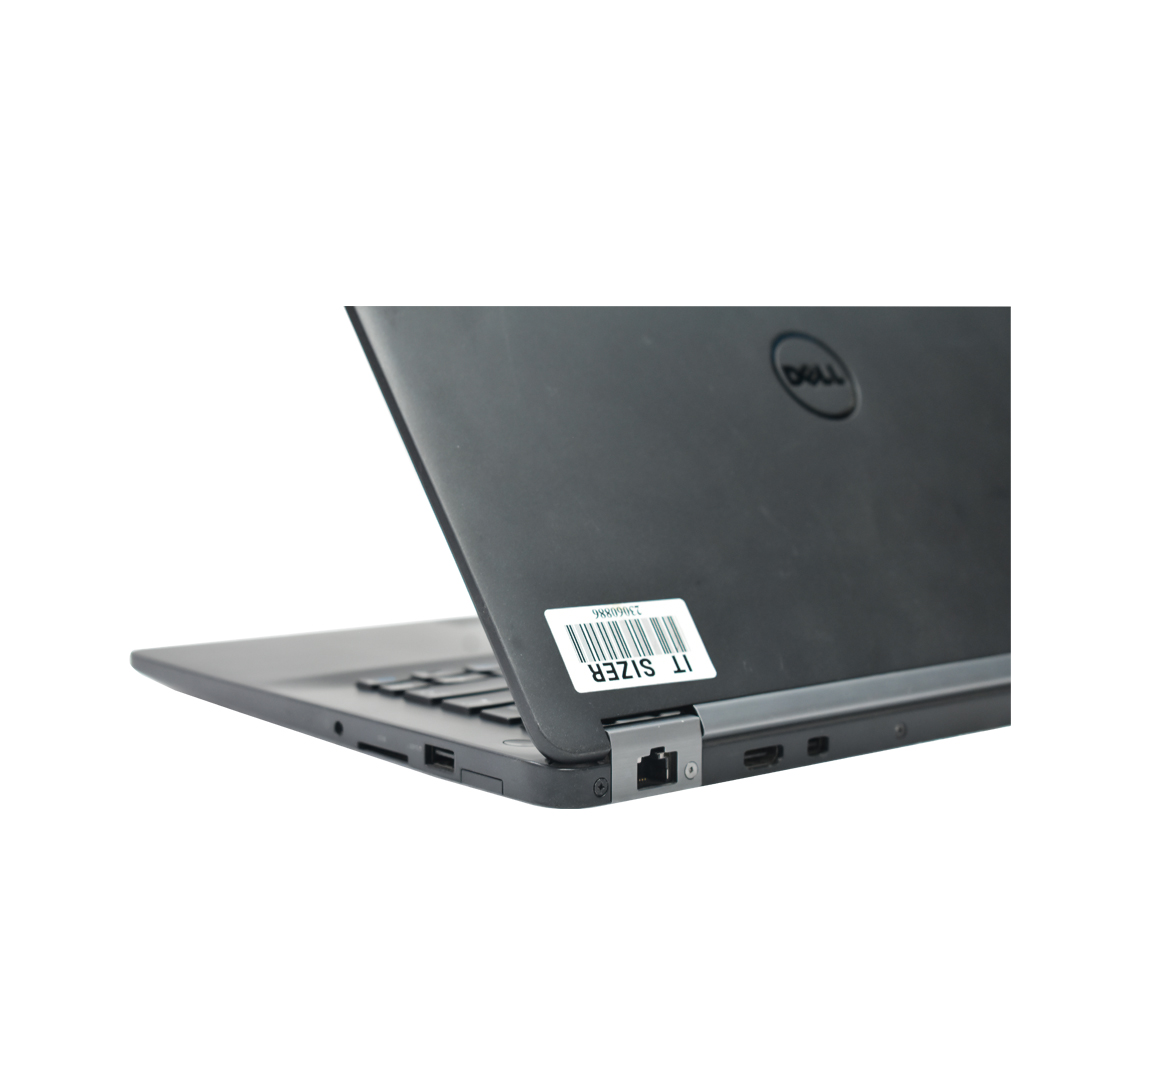 Dell Latitude E7470 Business Laptop, INTEL CORE I5-6300U CPU CPU, 8GB DDR3L SODIMM RAM, 256GB SSD 2.5, 14 inch Display, Windows 10 (Refurbished)